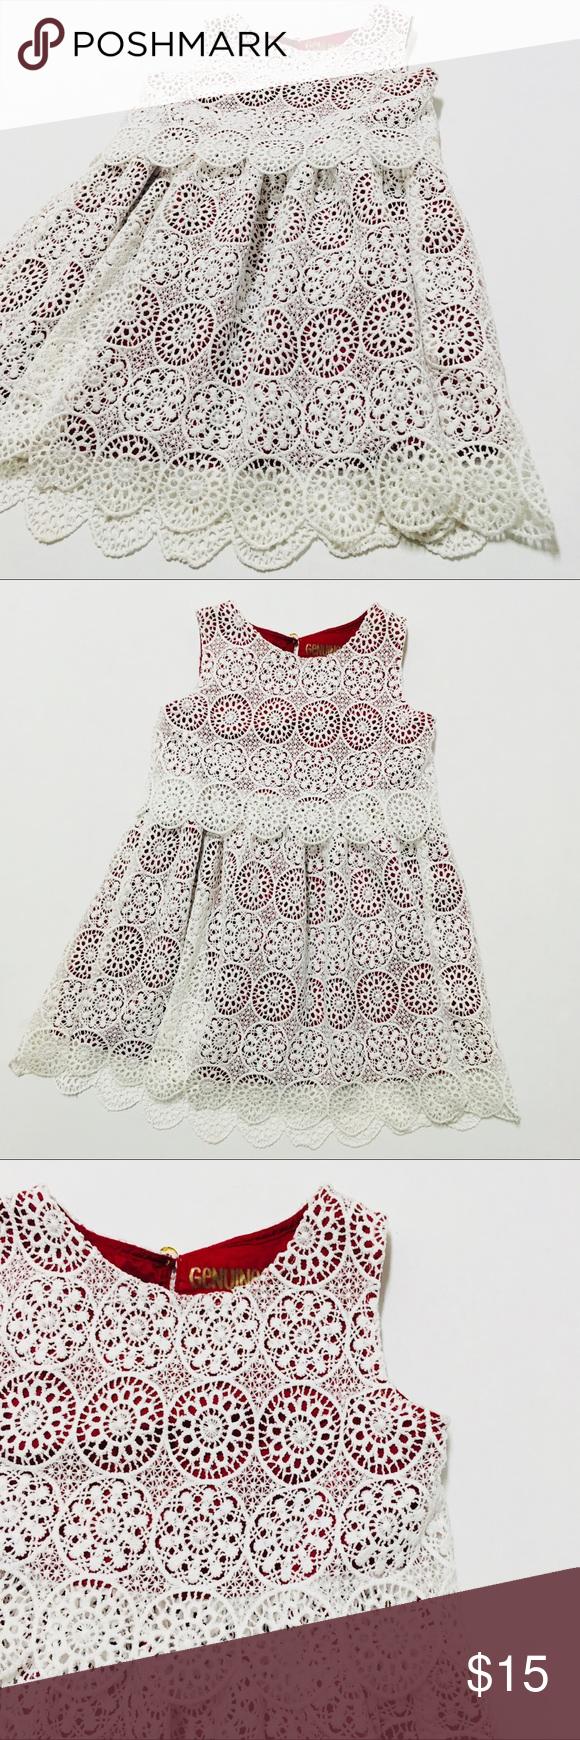 Genuine Kids Girls Doily Lace Party Dress 5t Lace Party Dresses Dresses 5t Crochet Lace Dress [ 1740 x 580 Pixel ]